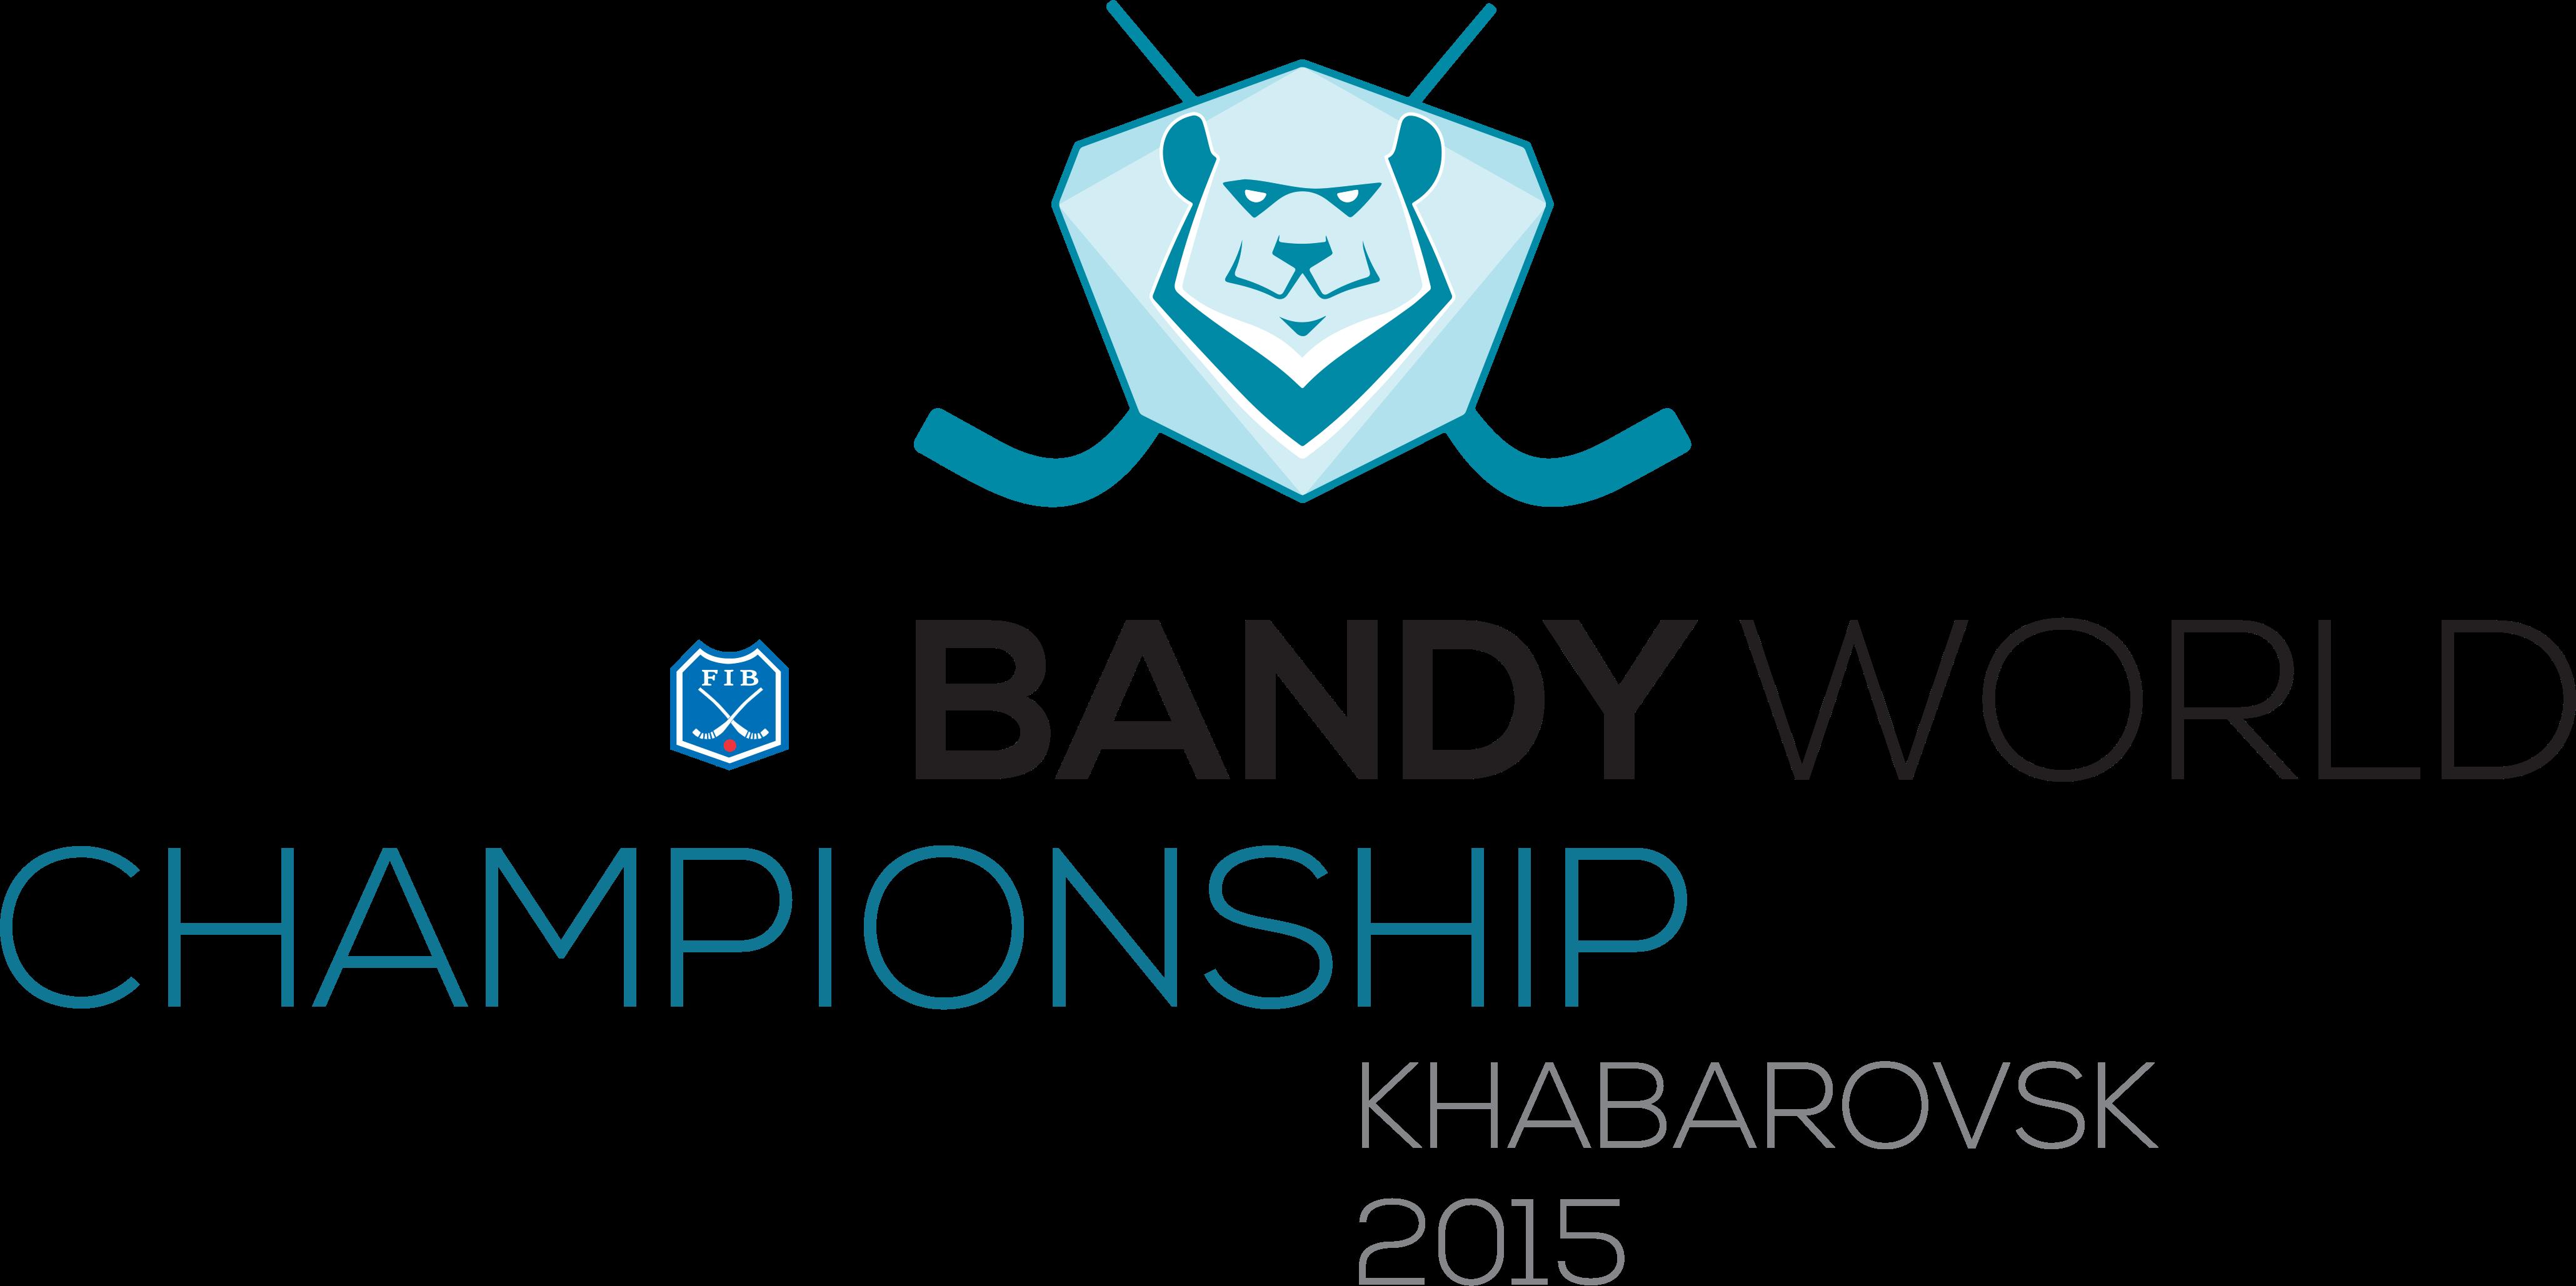 World Championship - Chabarovsk, Russia